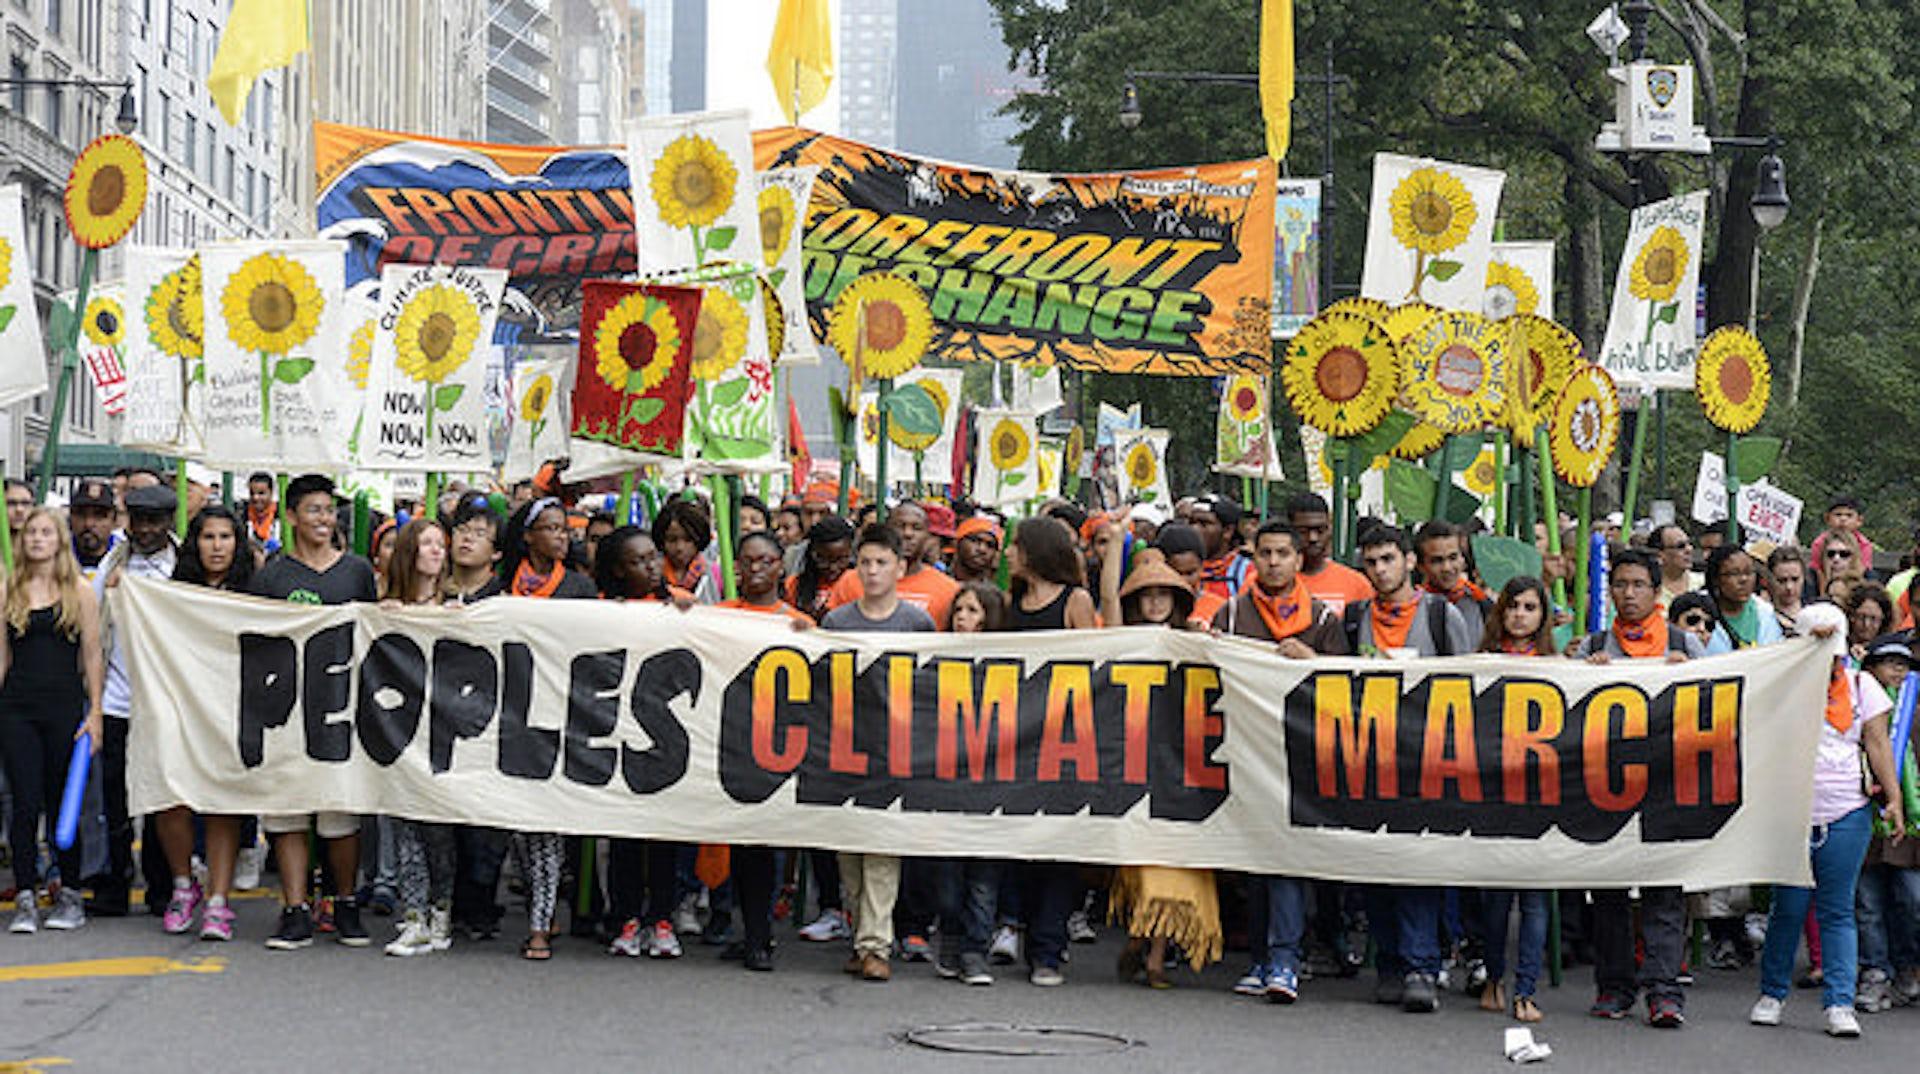 Naomi Klein or Al Gore? Making sense of contrasting views on climate change